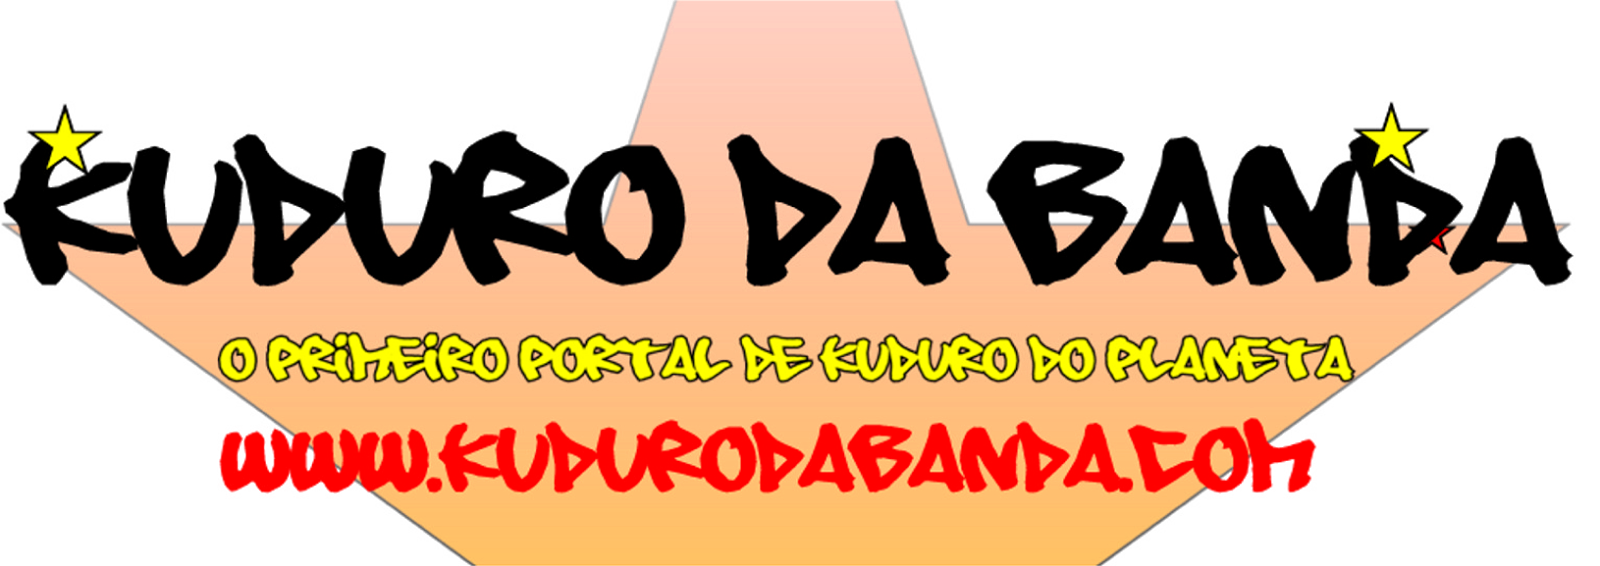 KUDURO DA BANDA! É mesmo!!!